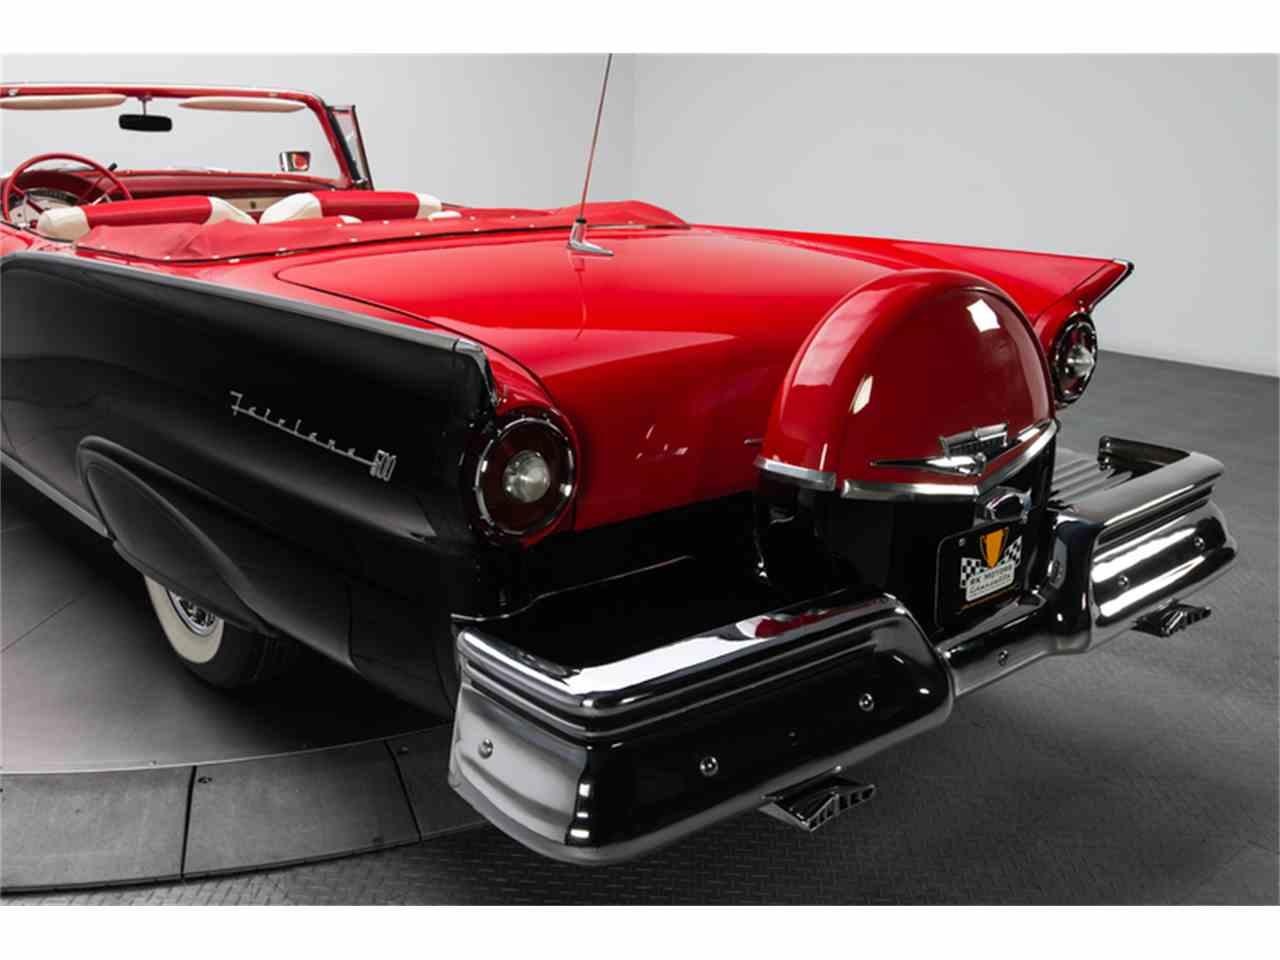 Large Picture of '57 Fairlane 500 located in North Carolina - $94,900.00 - LT6X